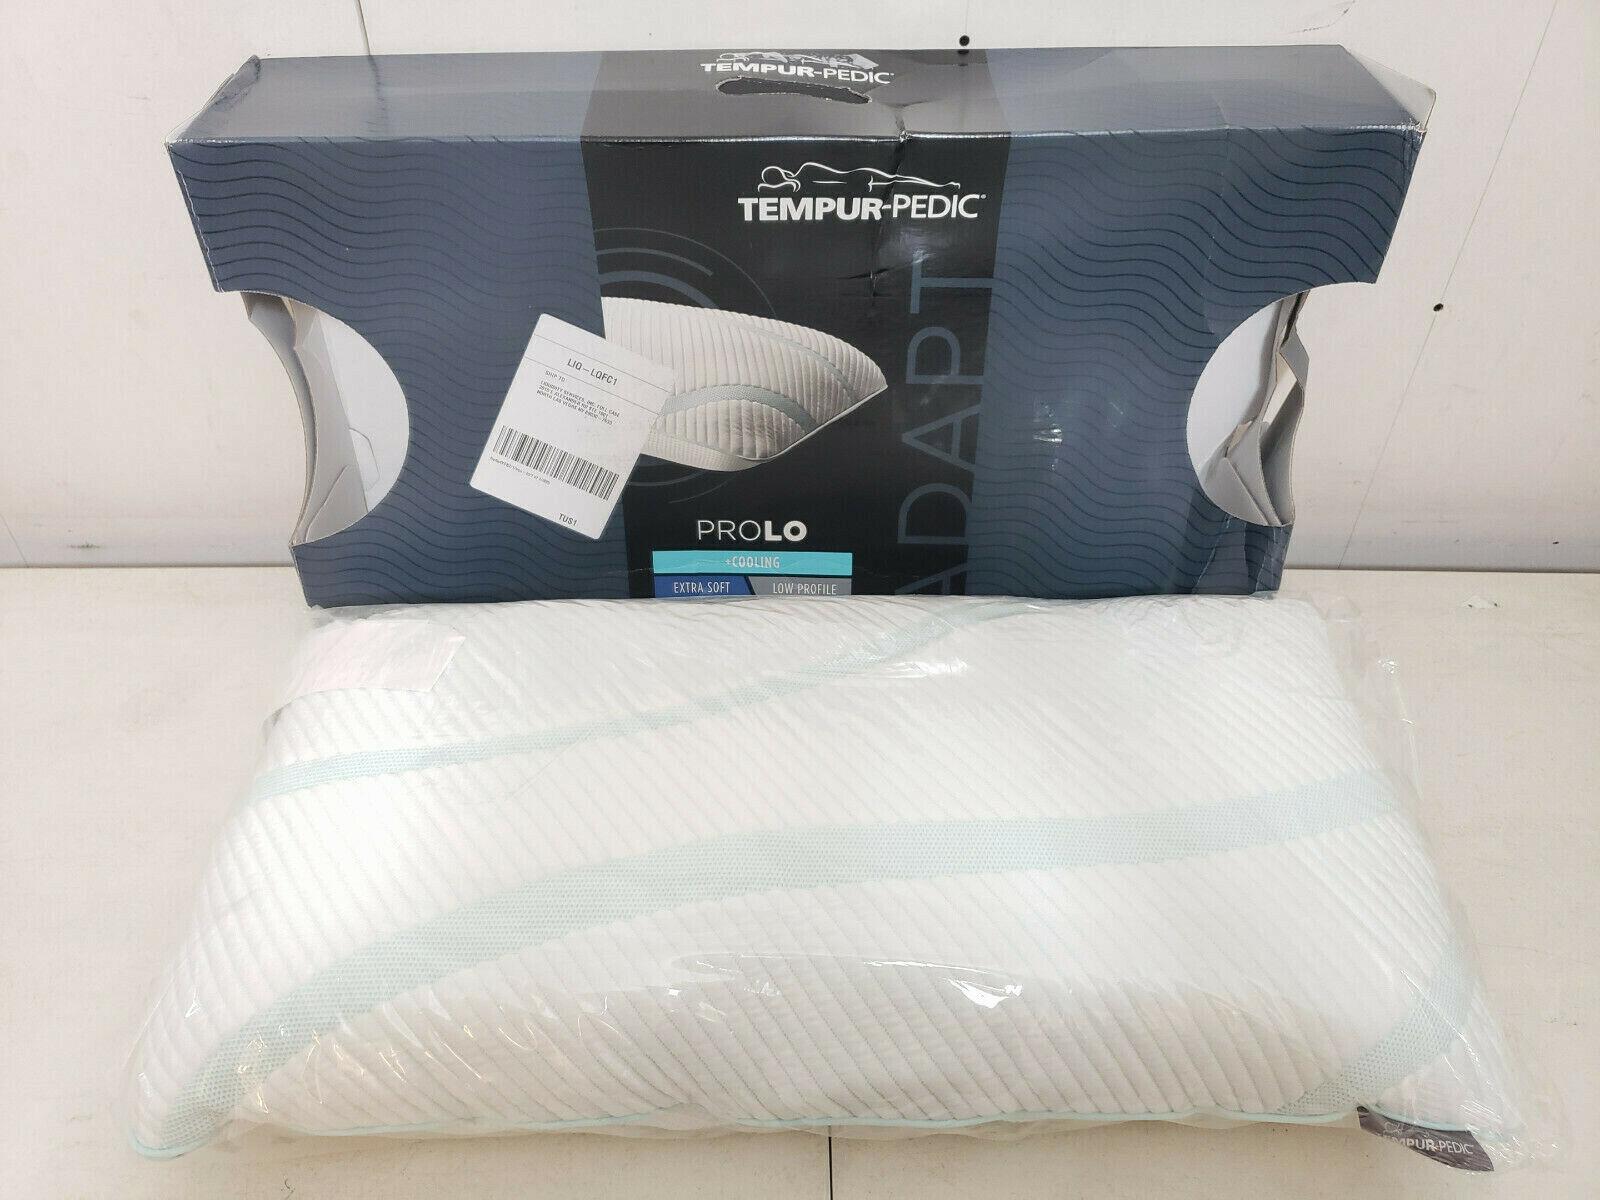 tempurpedic prolo cooling pillow online